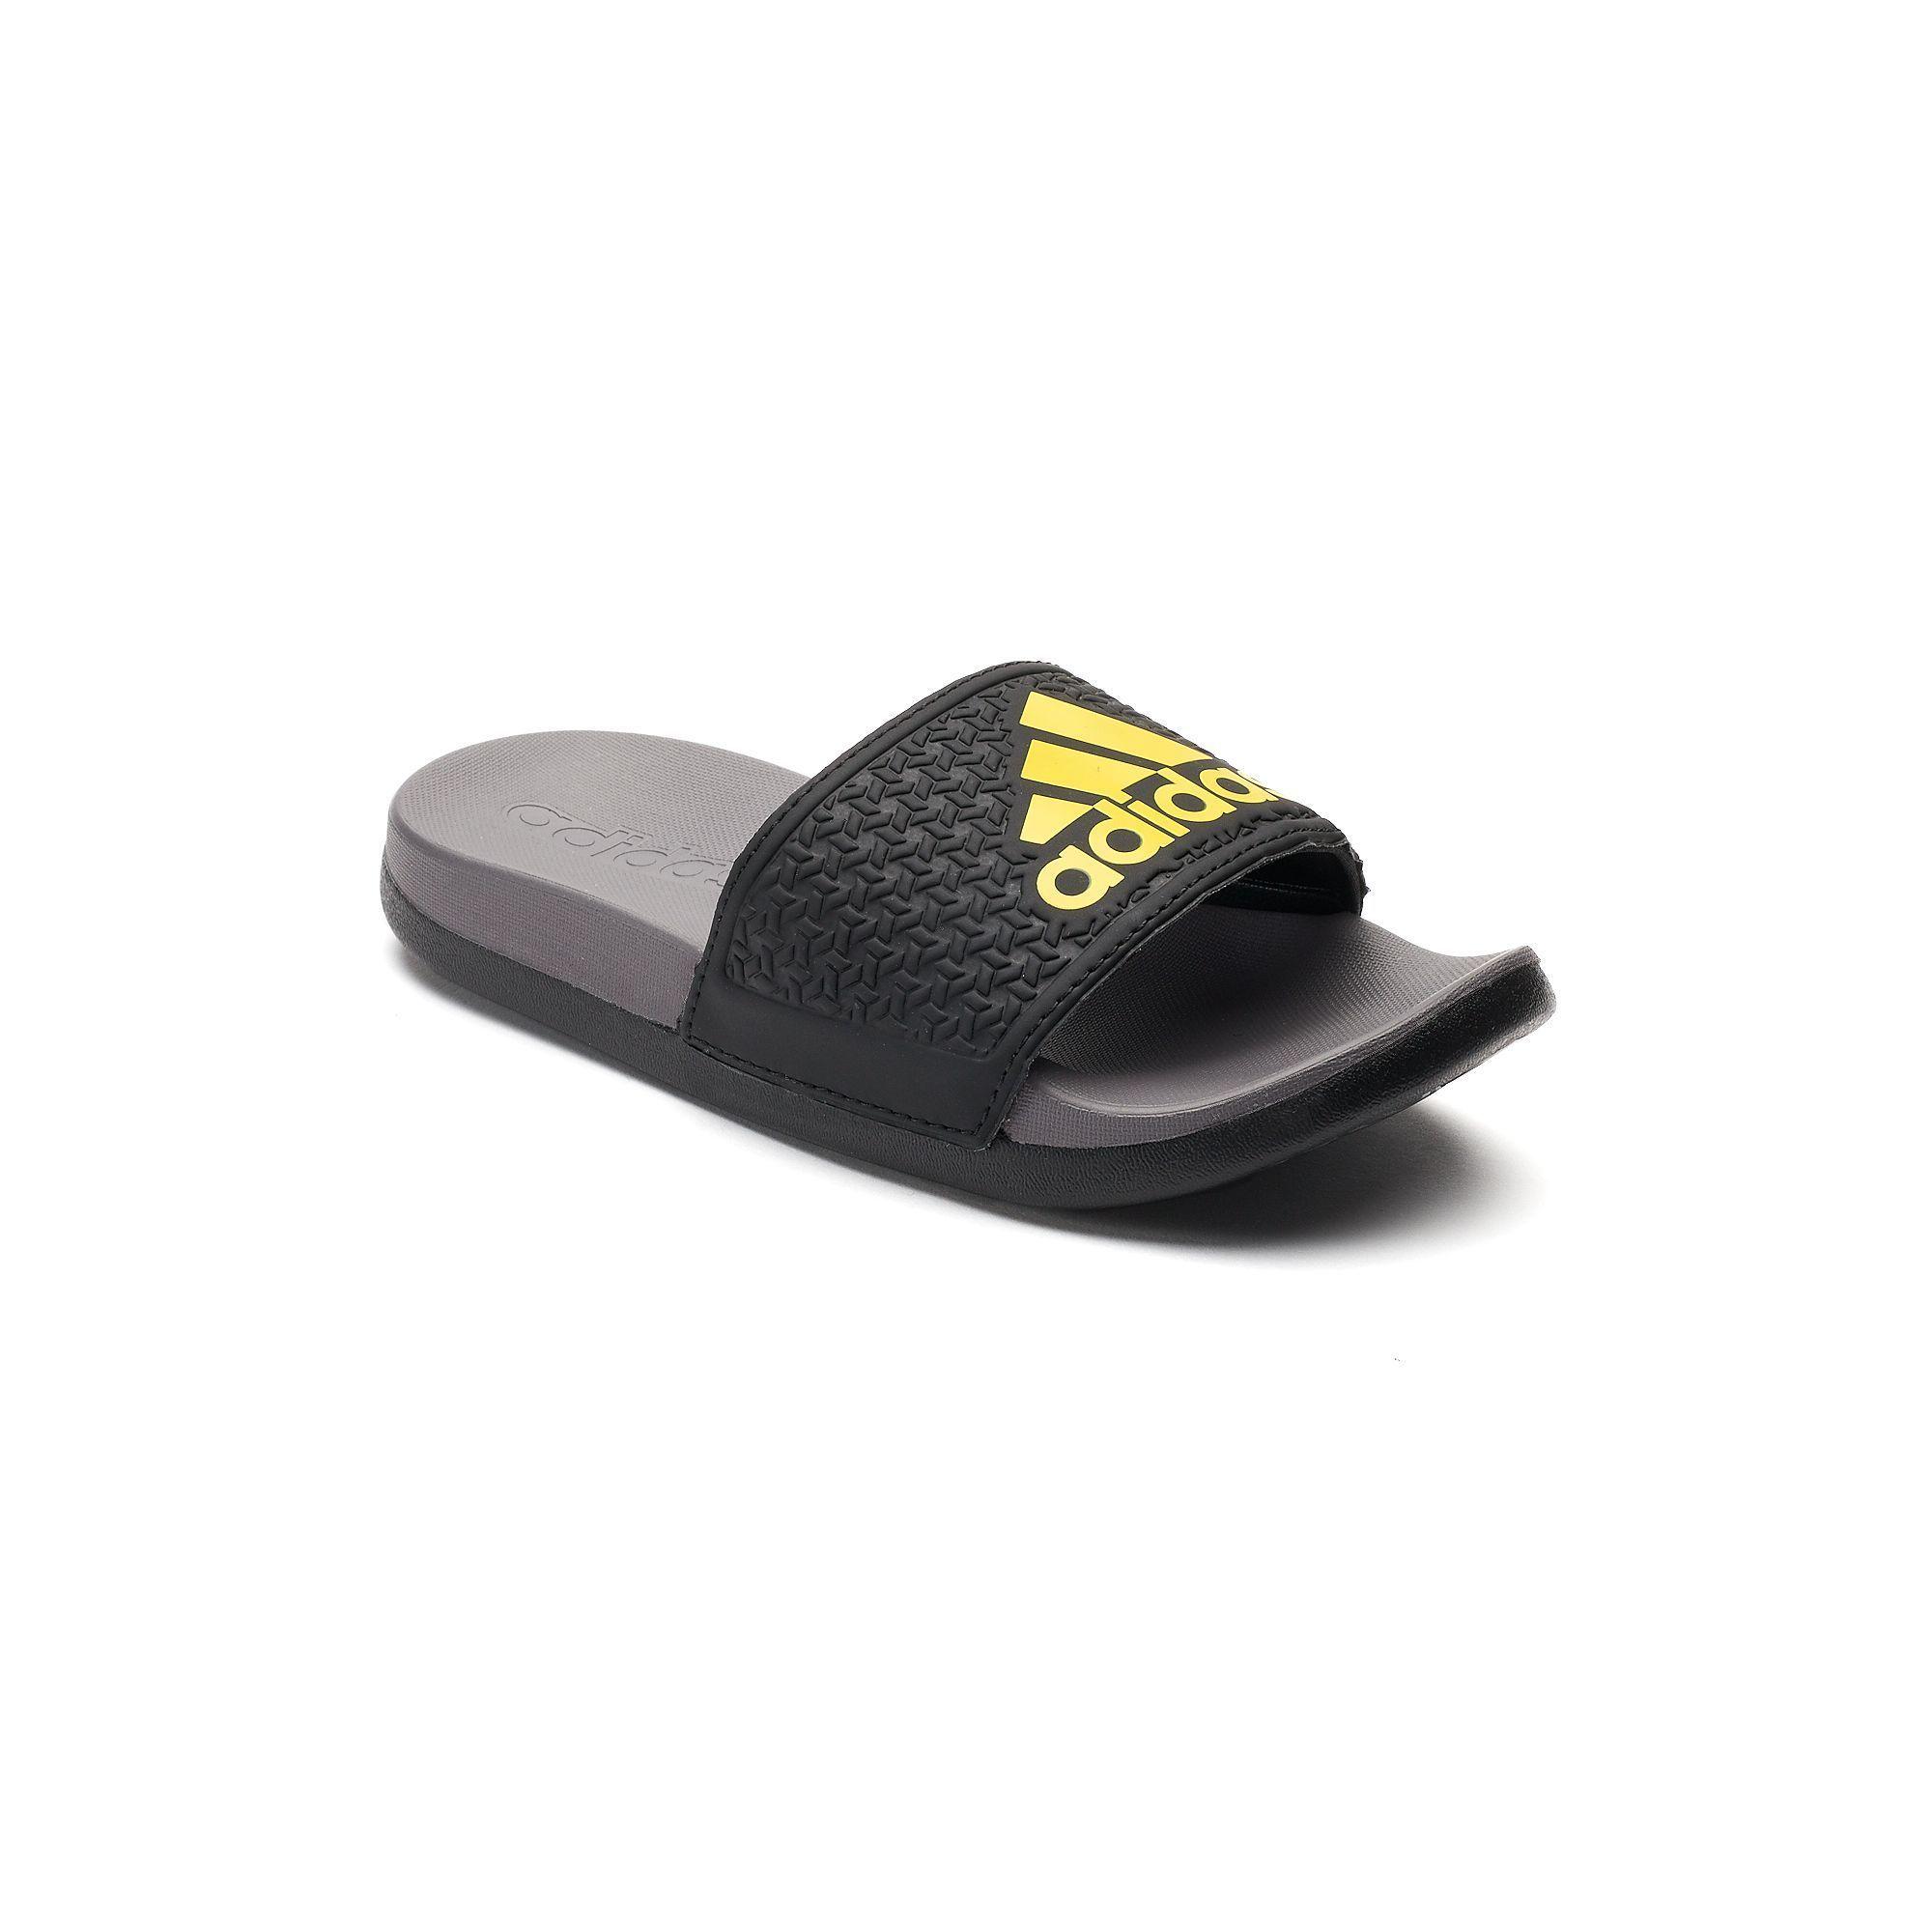 b398604d749fa adidas Adilette Cloudfoam Plus Kids  Slide Sandals